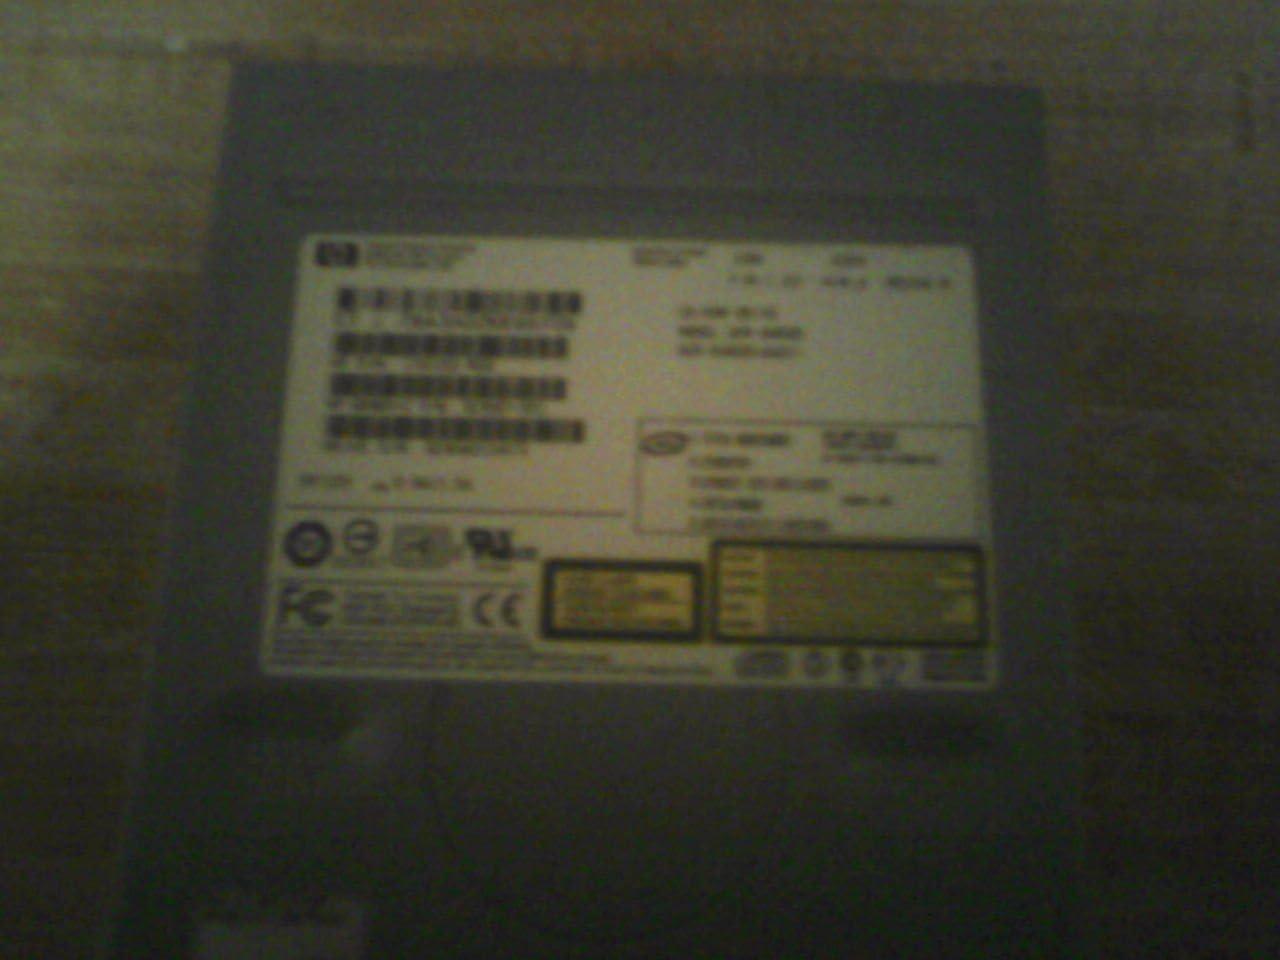 D4384A HP 32x CD-ROM Drive D4384A